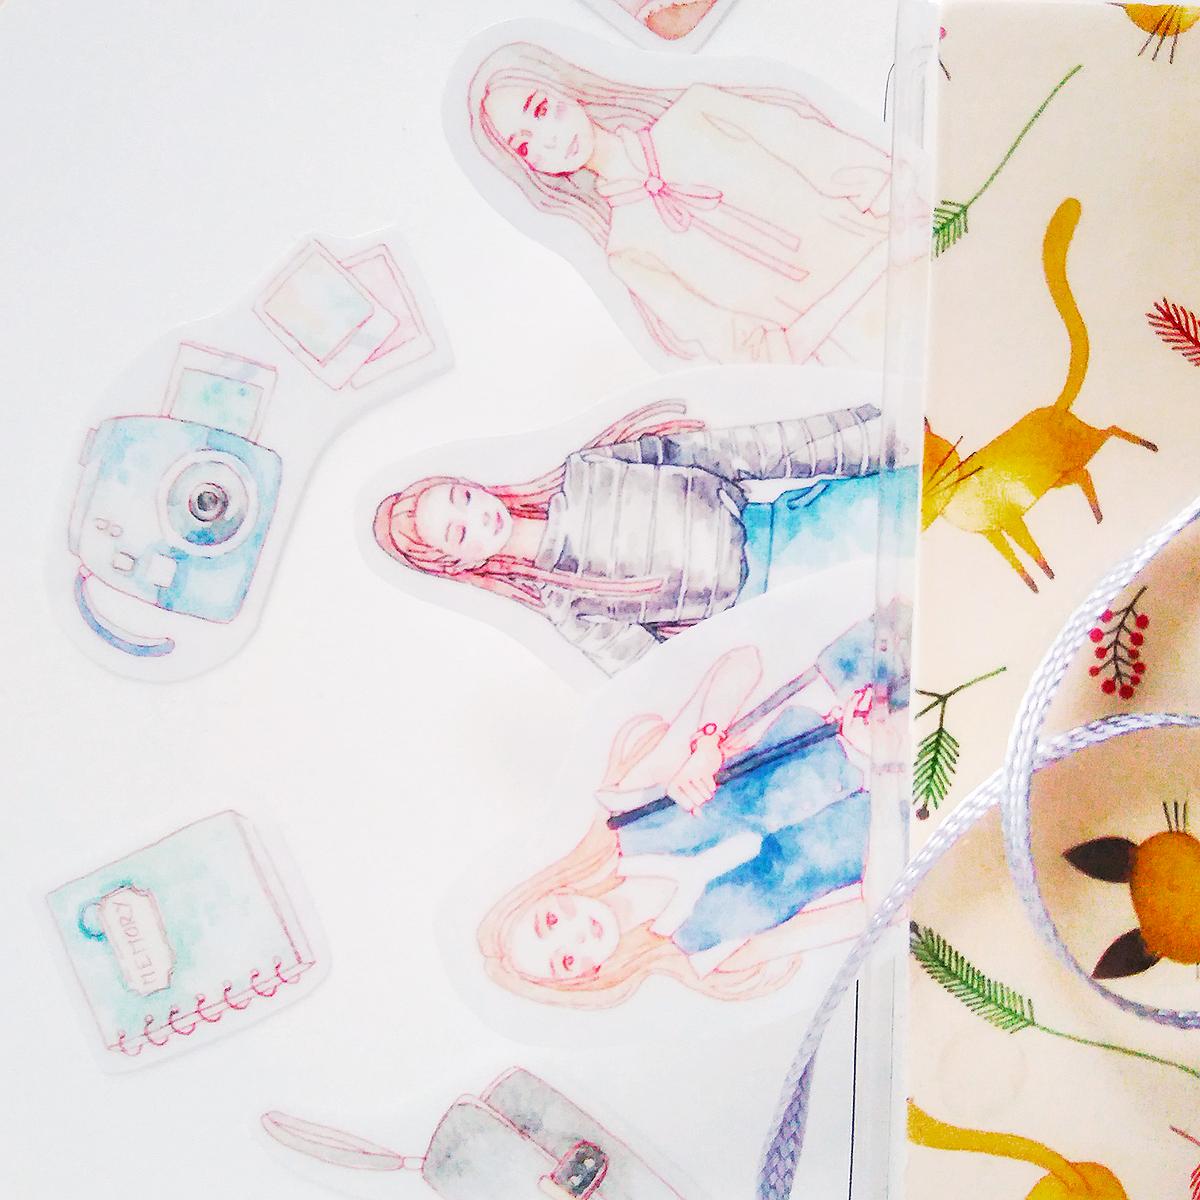 Sneak peek for upcoming transparent stickers!